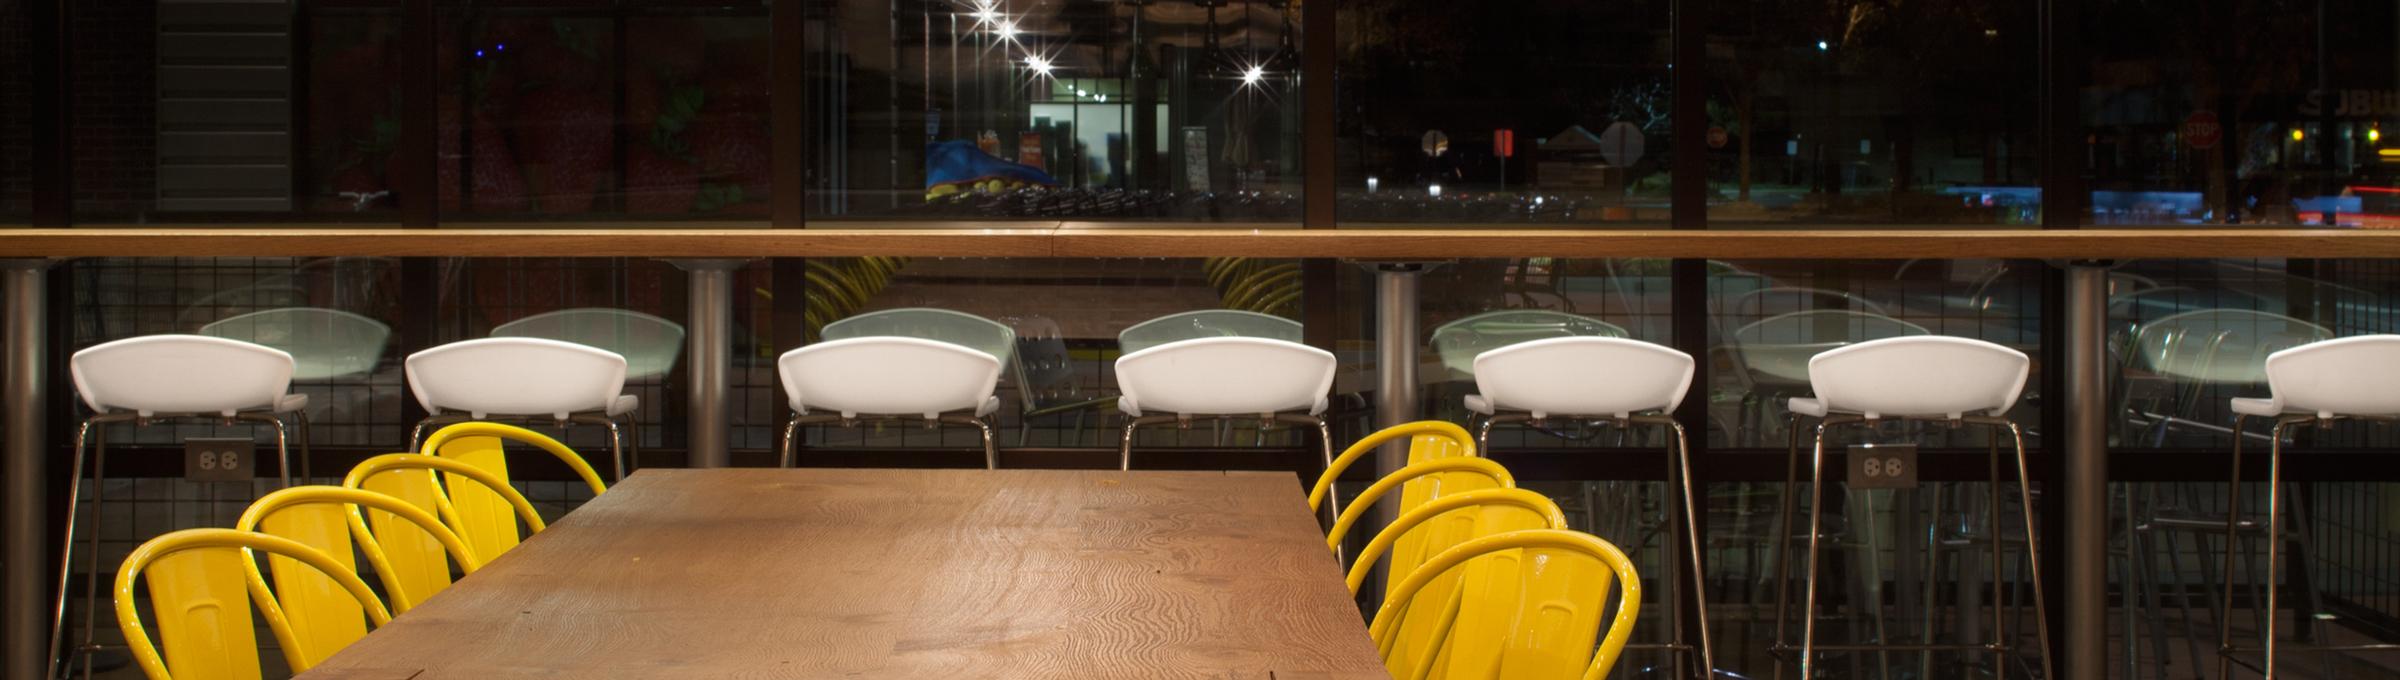 Longmont Store Slideshow Image